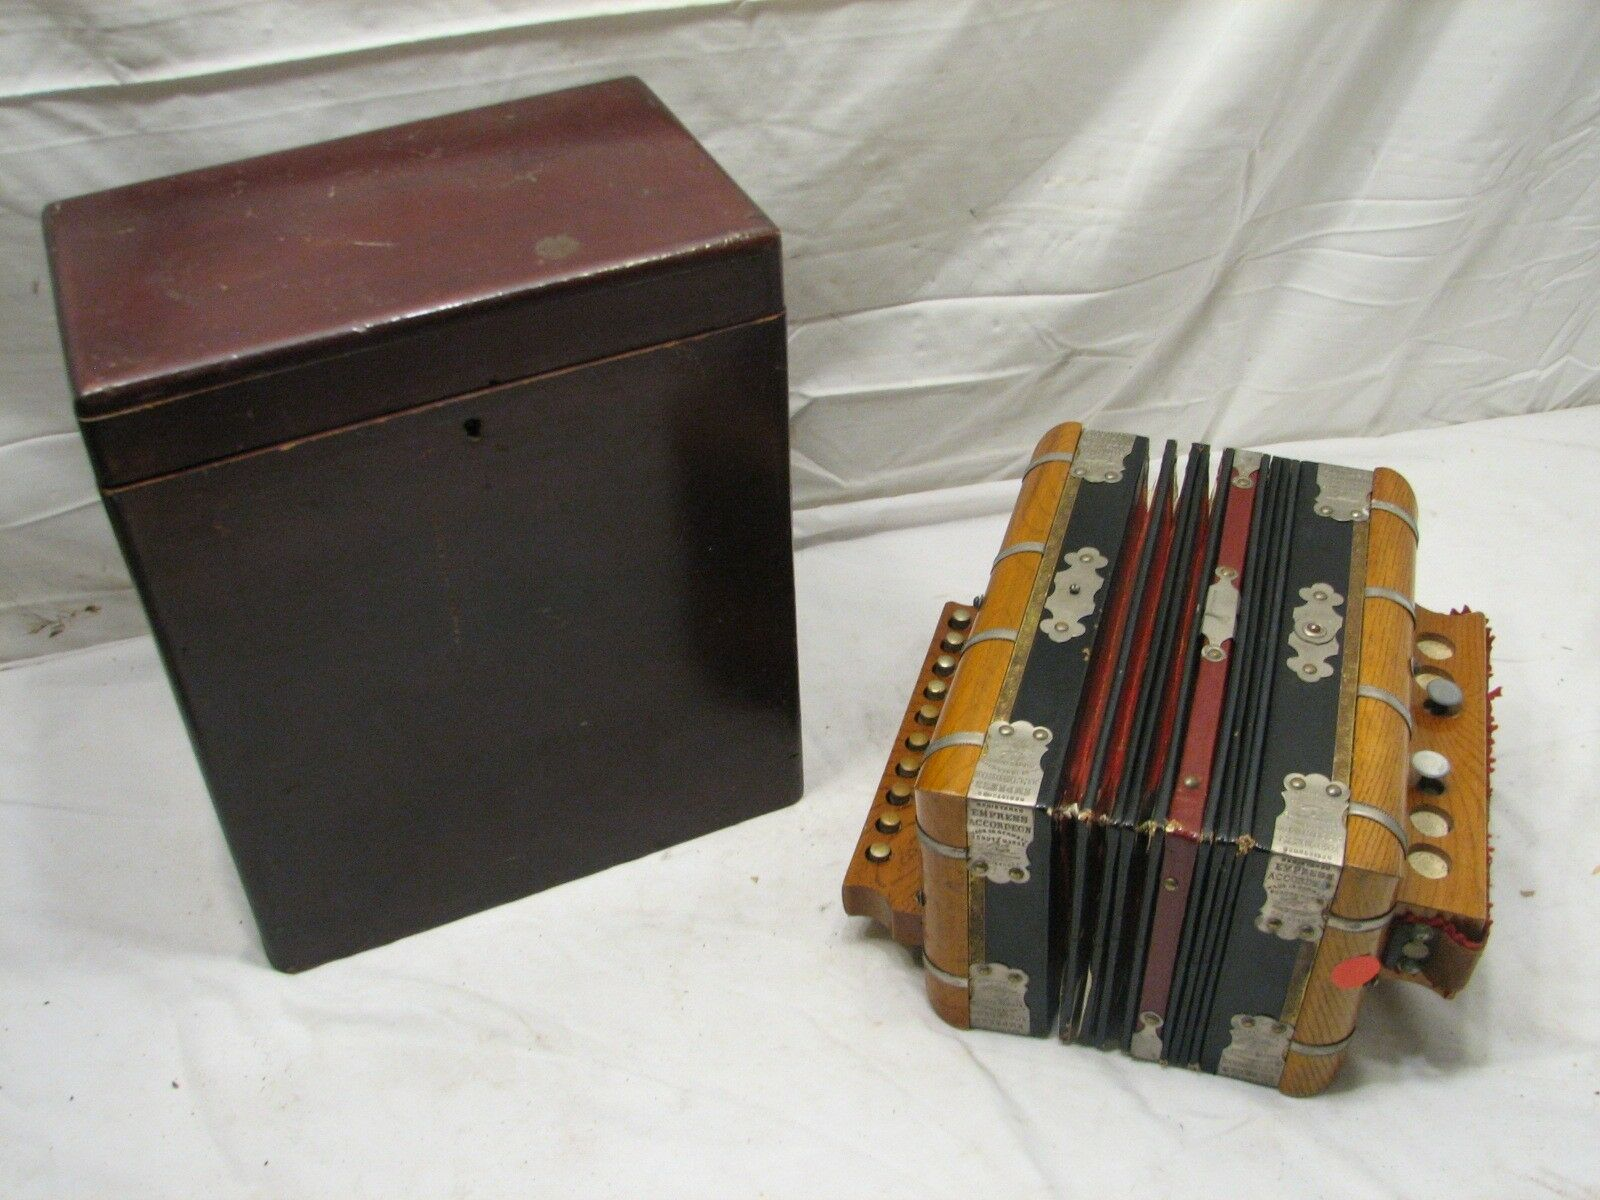 Antique Empress Accordeon Folk Instrument w Wooden Case Accordion Germany